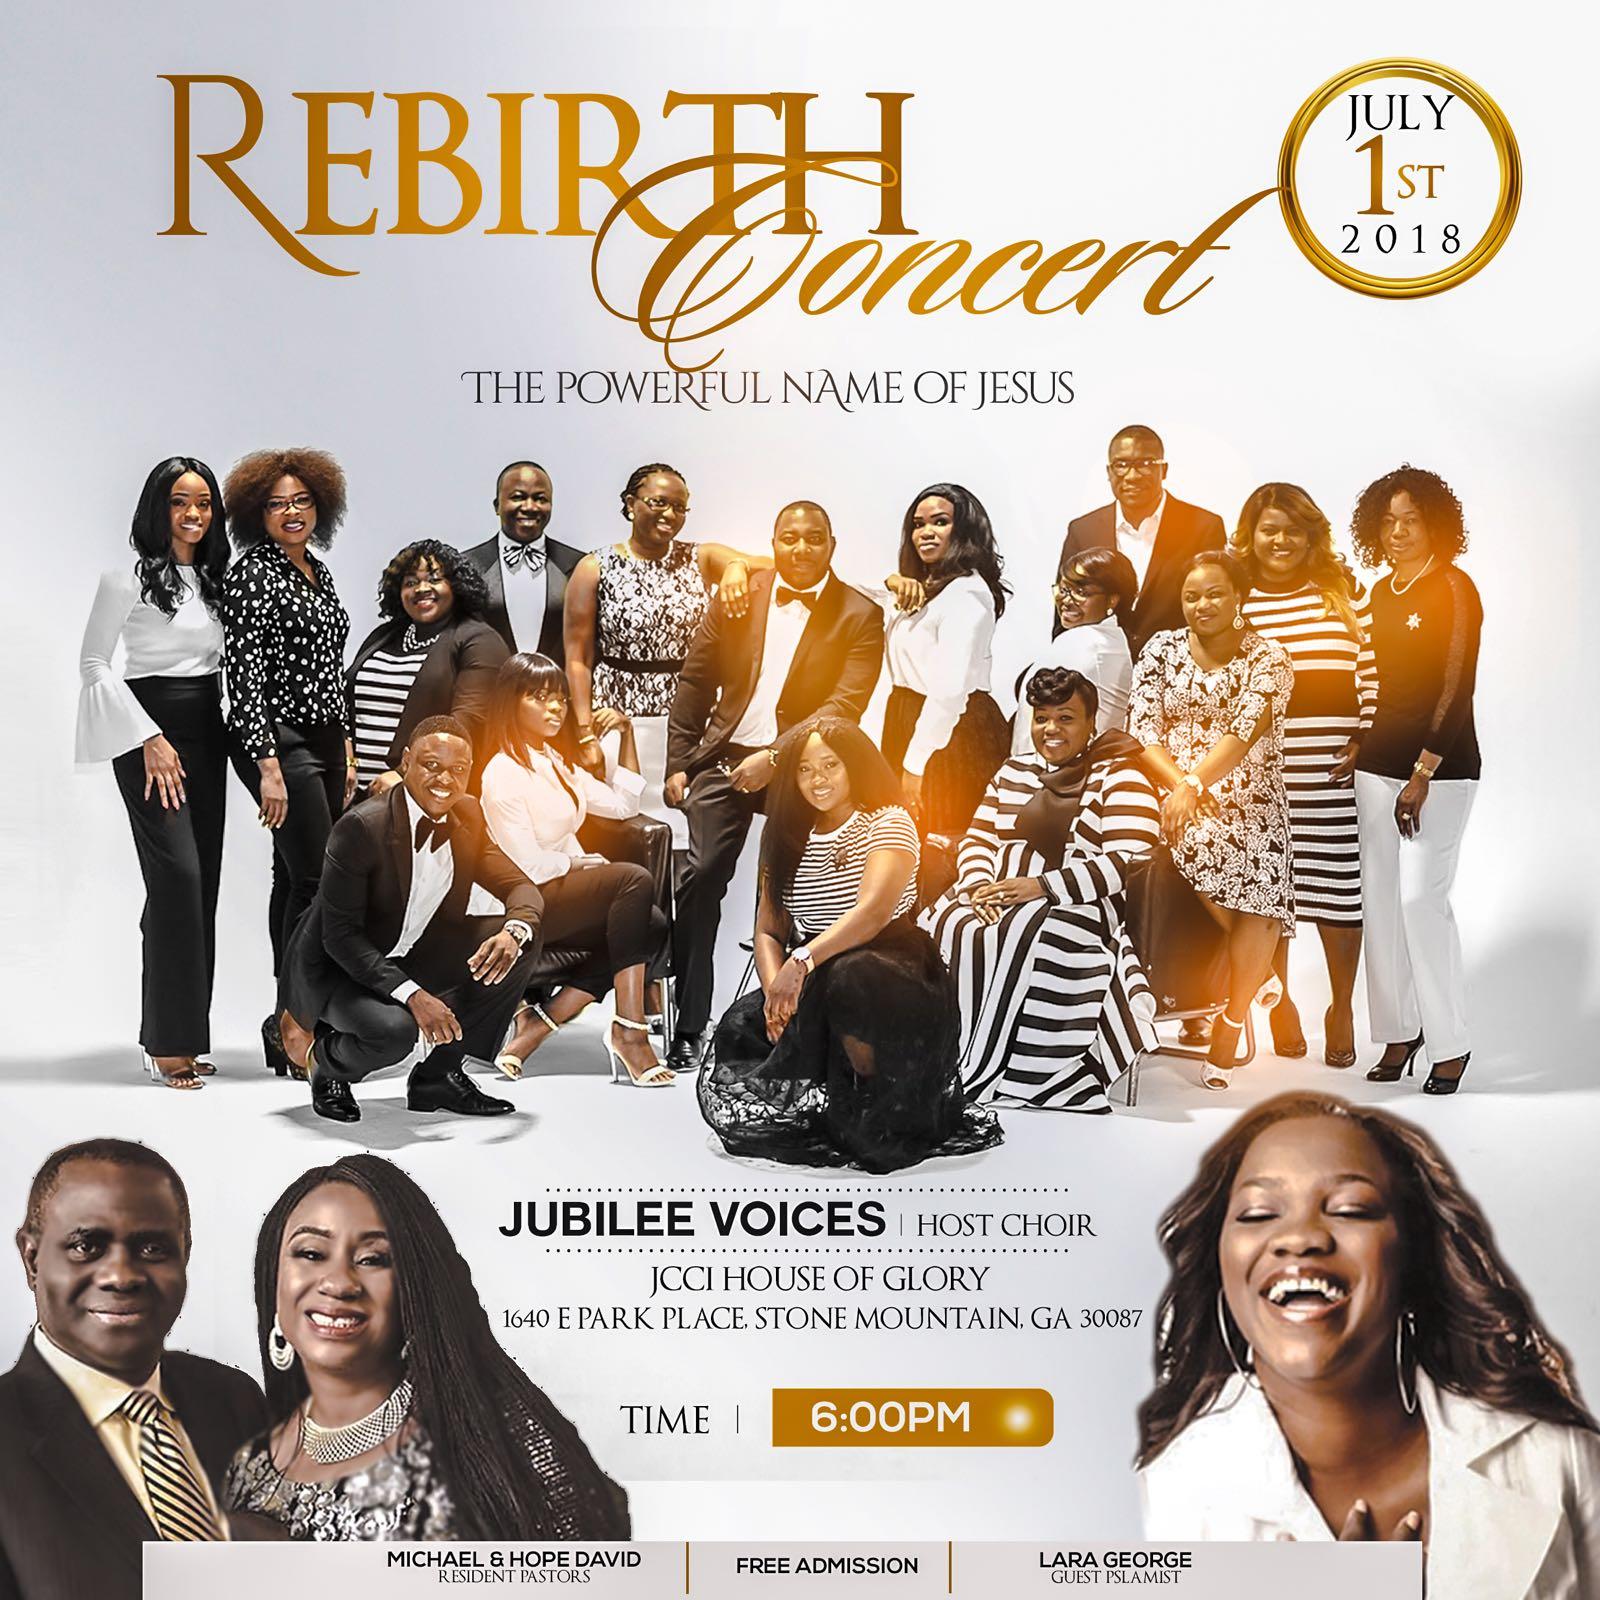 Rebirth Concert